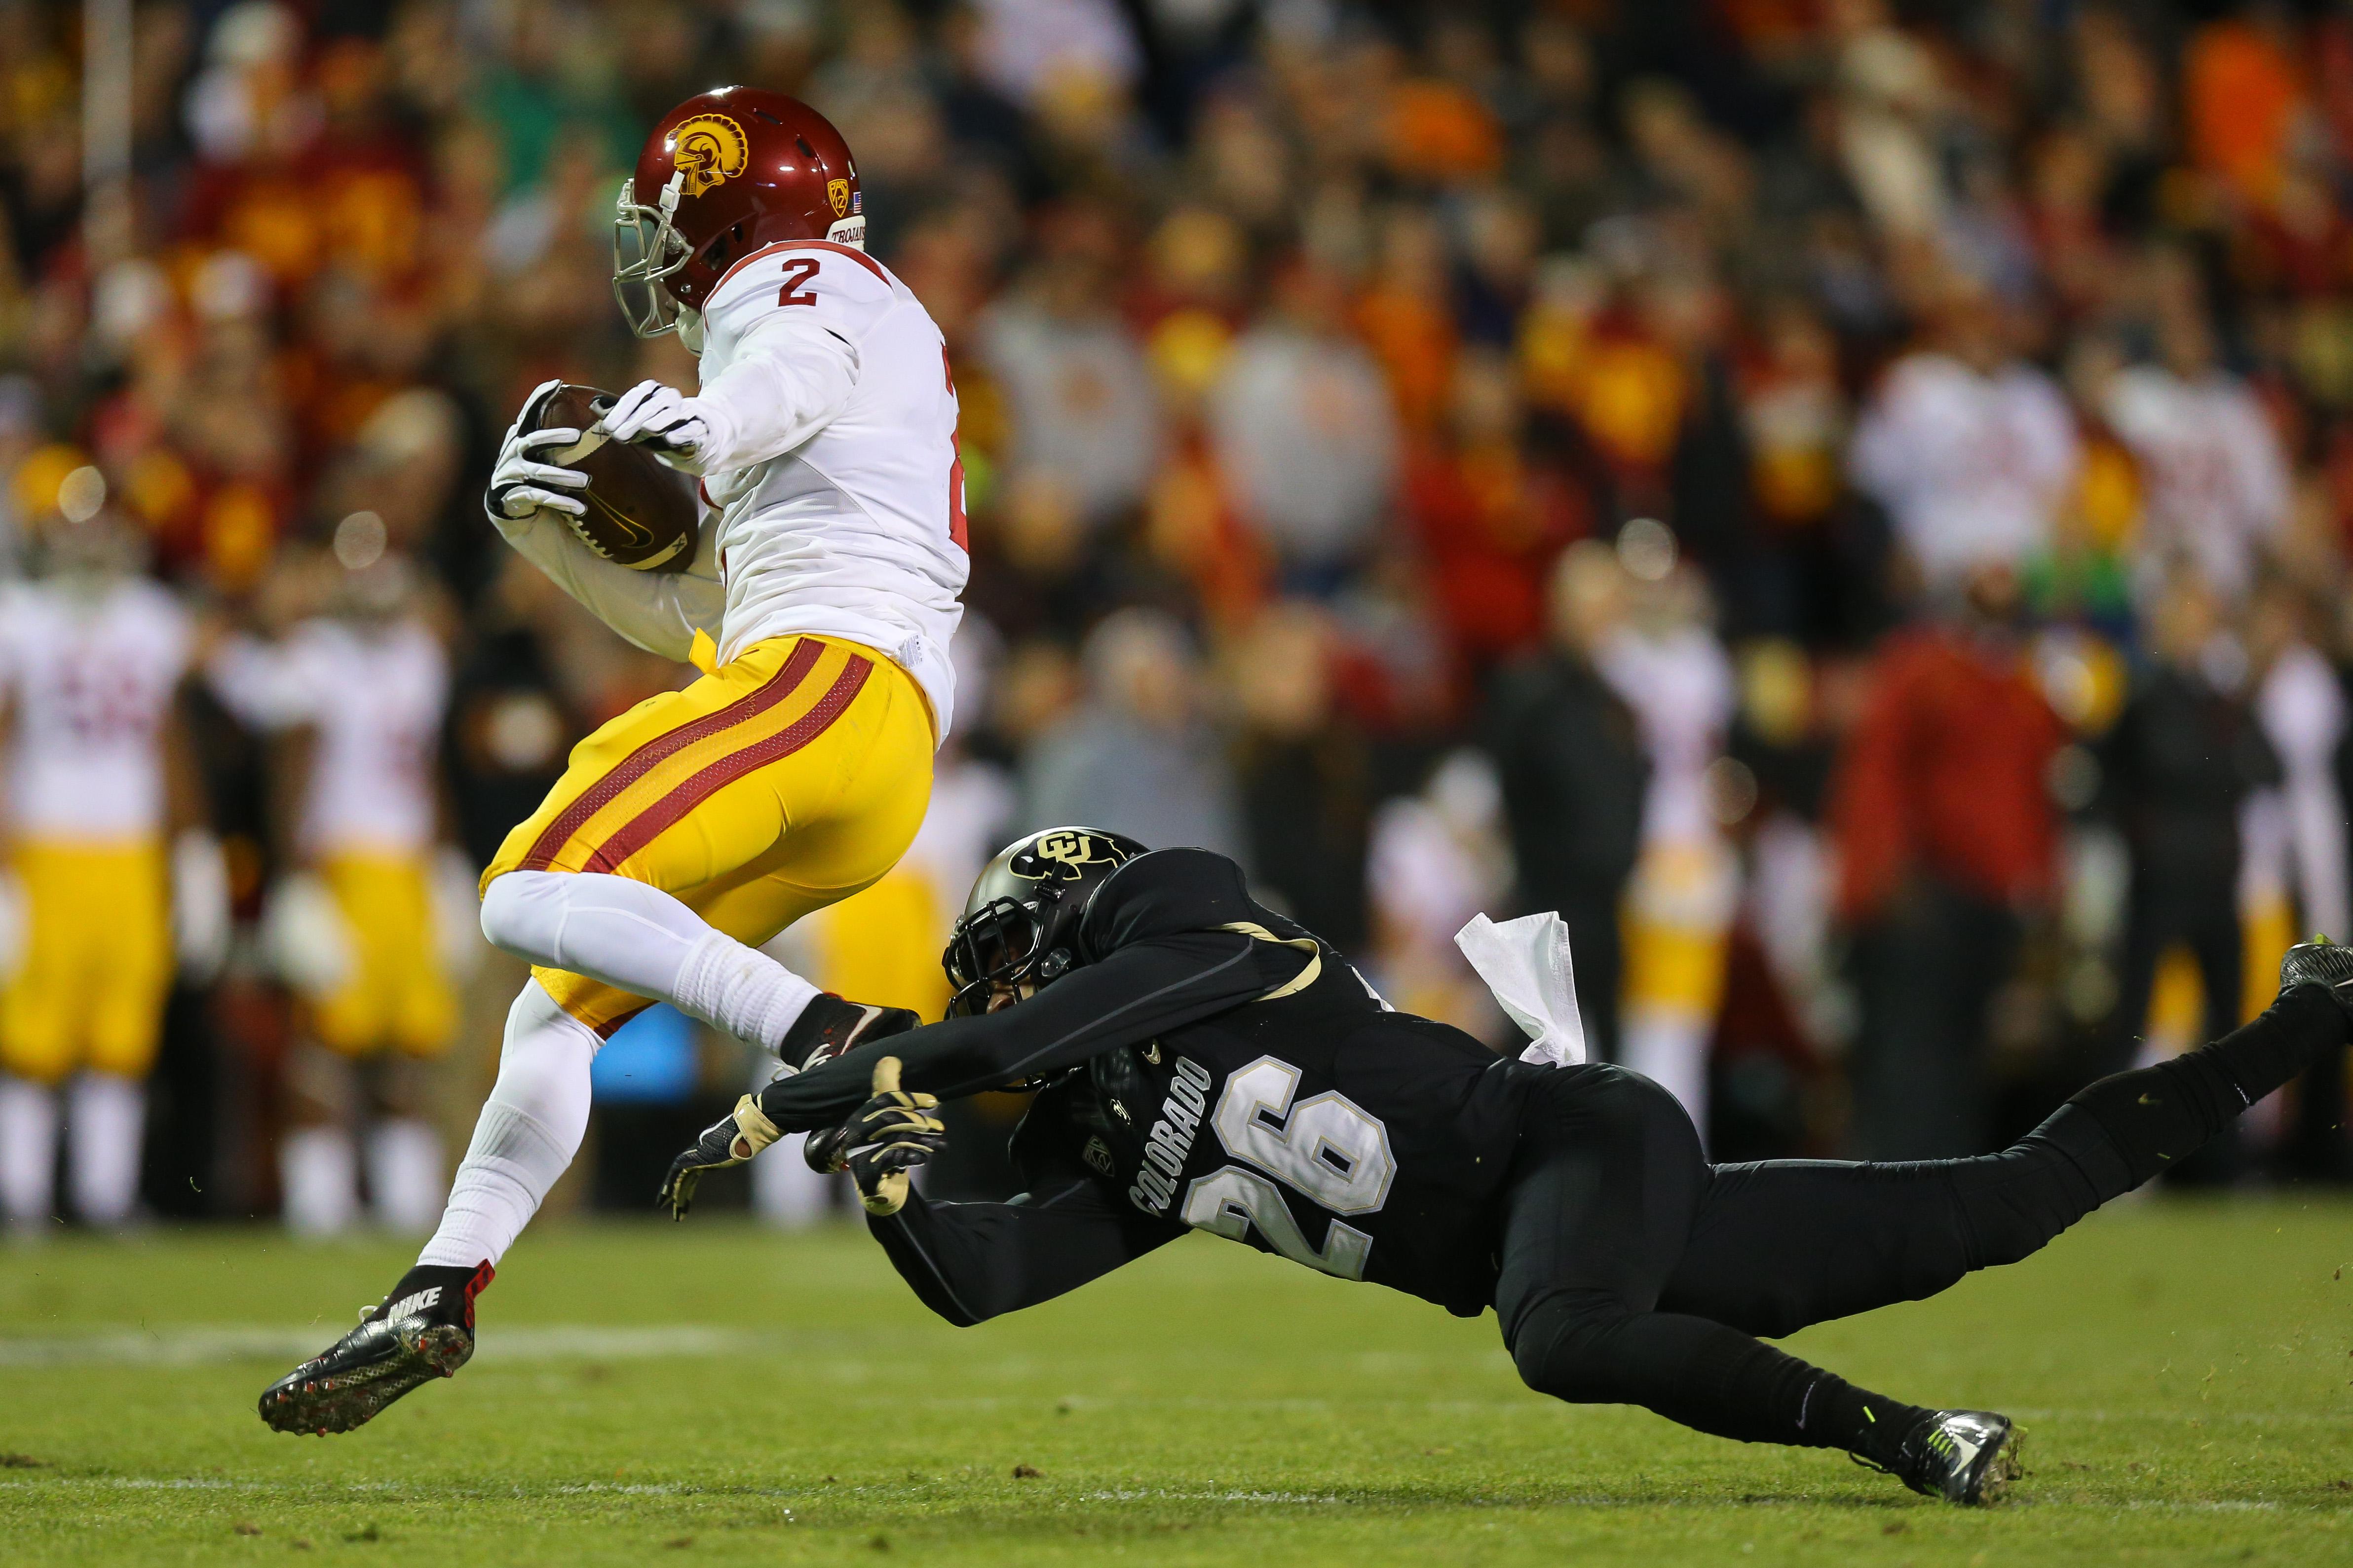 Colorado CB Isaiah Oliver tackles USC CB/KR/PR Adoree Jackson